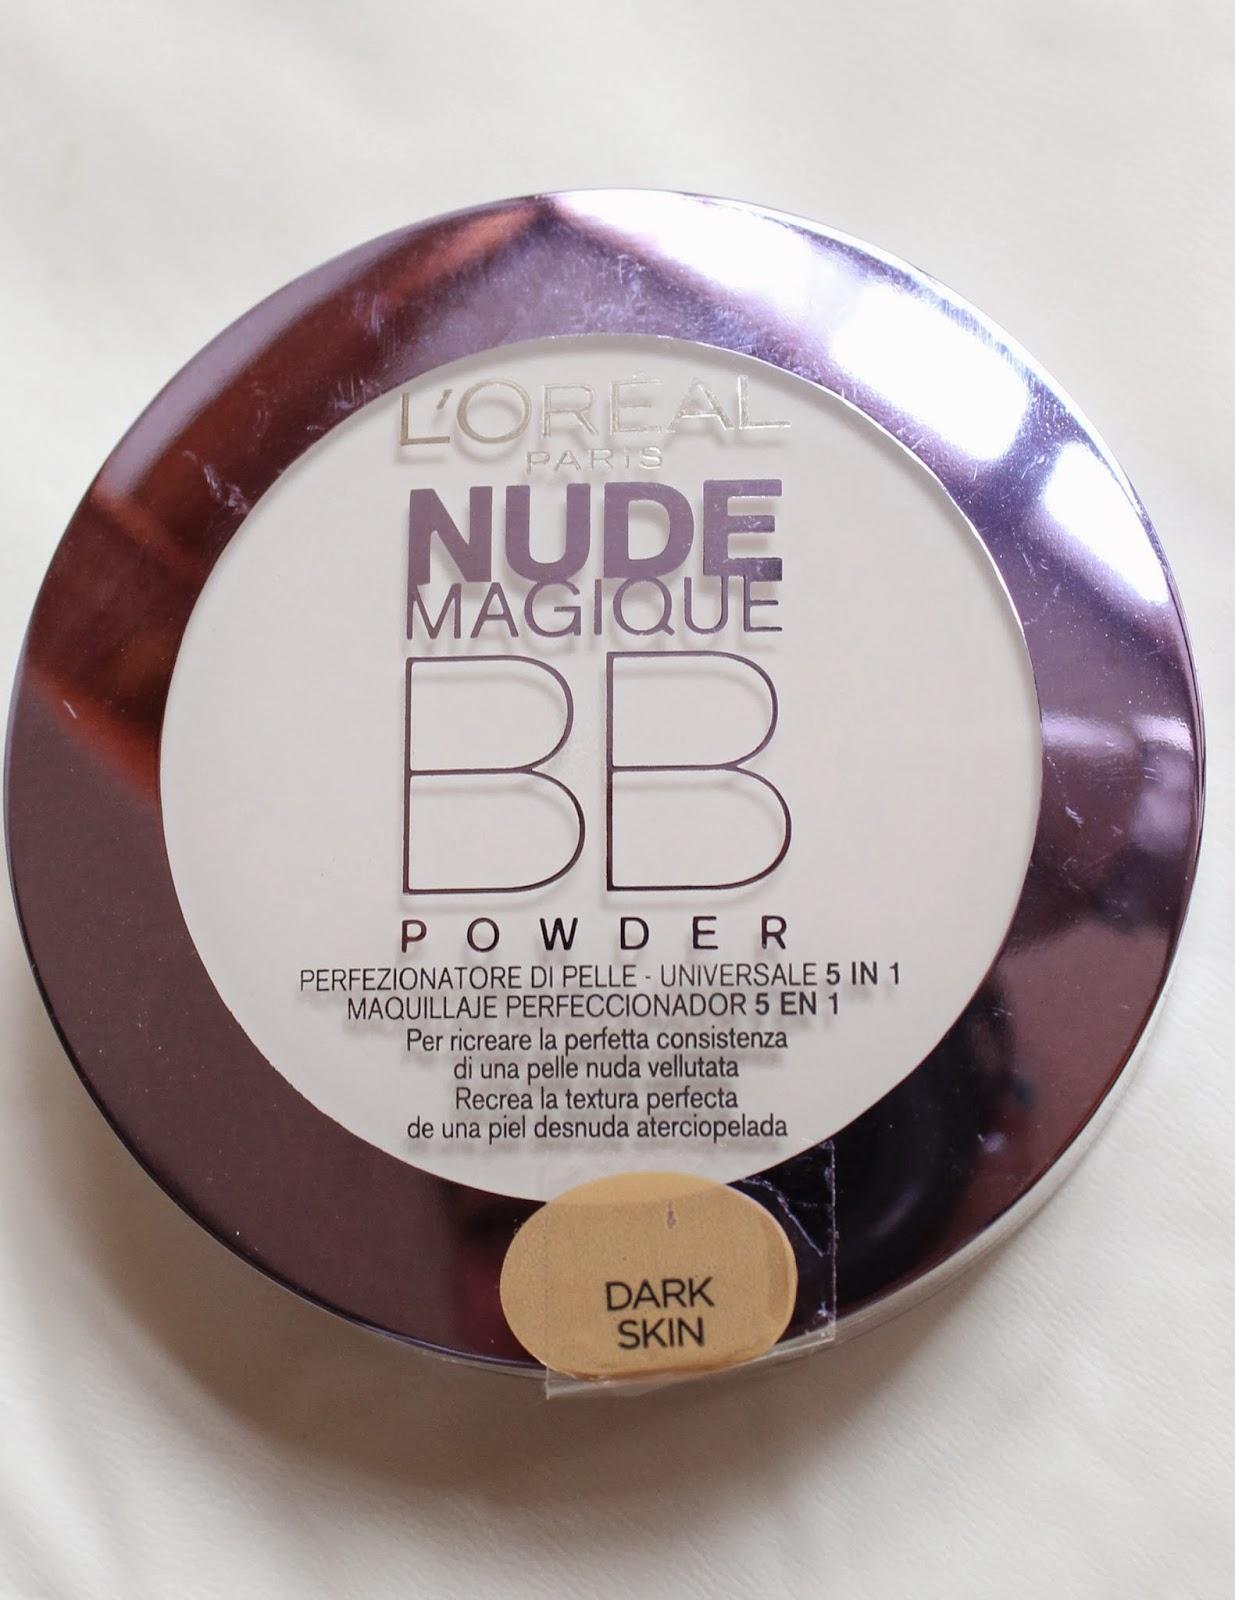 LOreal Paris Nude Magique BB Powder - Пудра   Makeupstore.ru